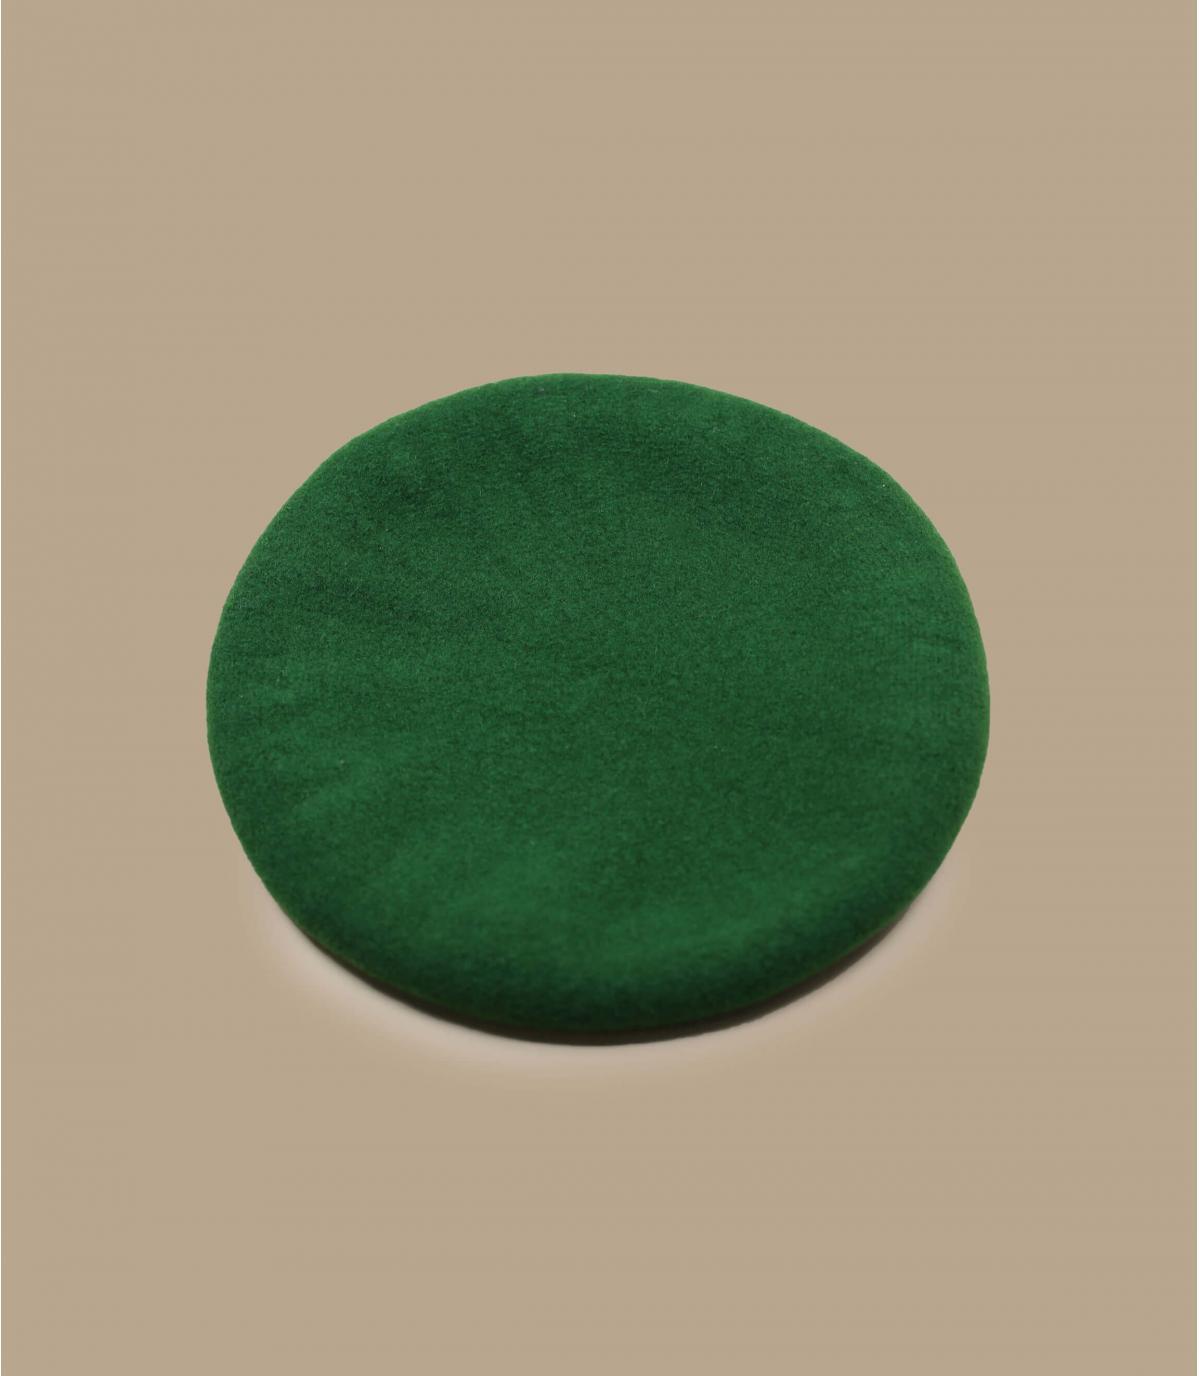 Detalles Béret Commando army green imagen 2